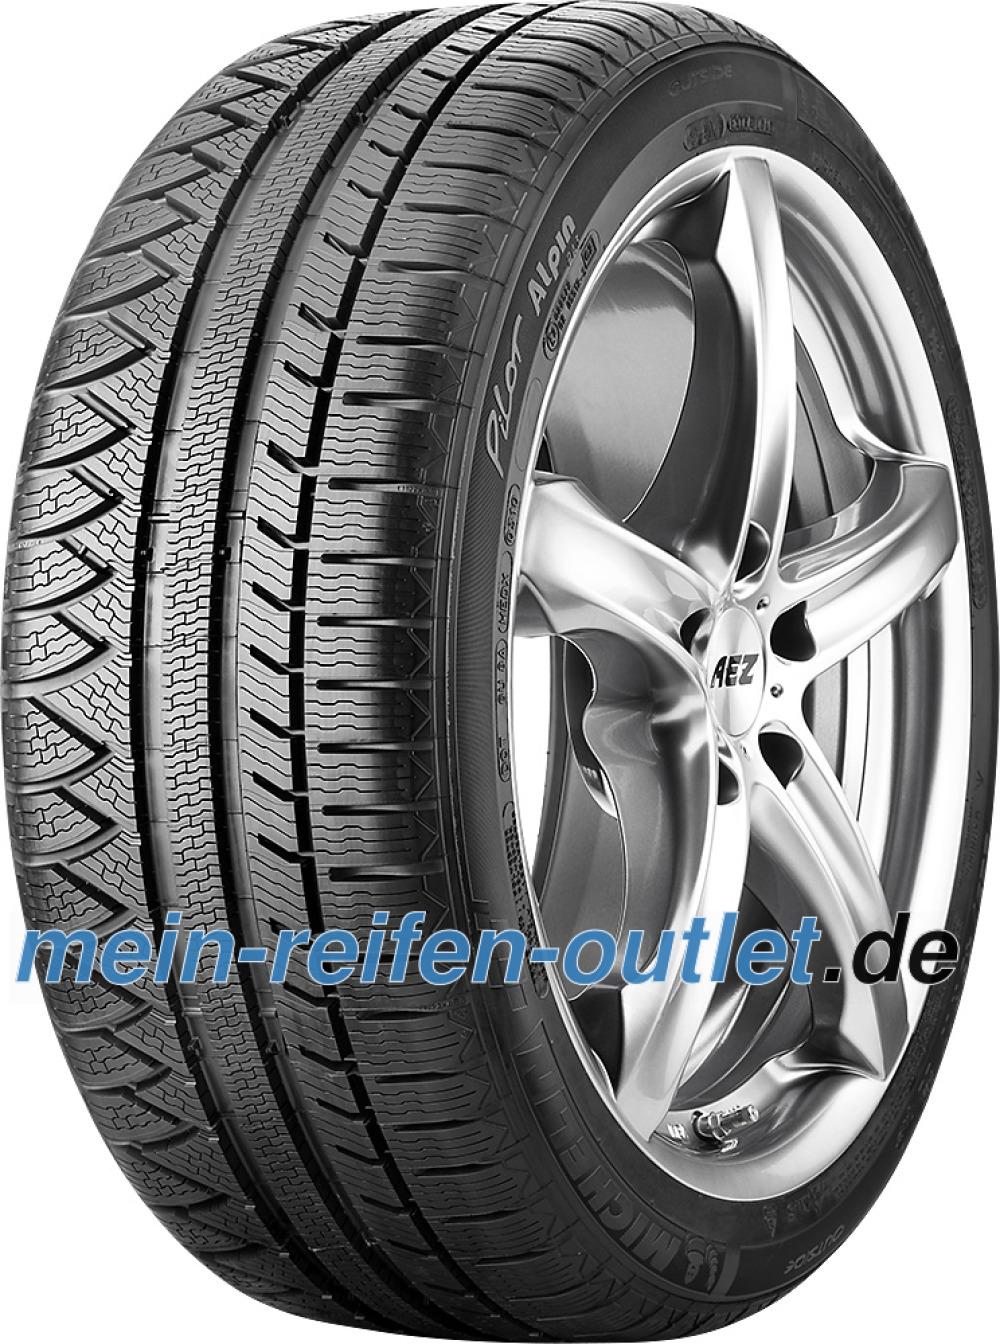 Michelin Pilot Alpin PA3 ( 245/45 R17 99V XL , MO, GRNX, mit Felgenschutzleiste (FSL) )